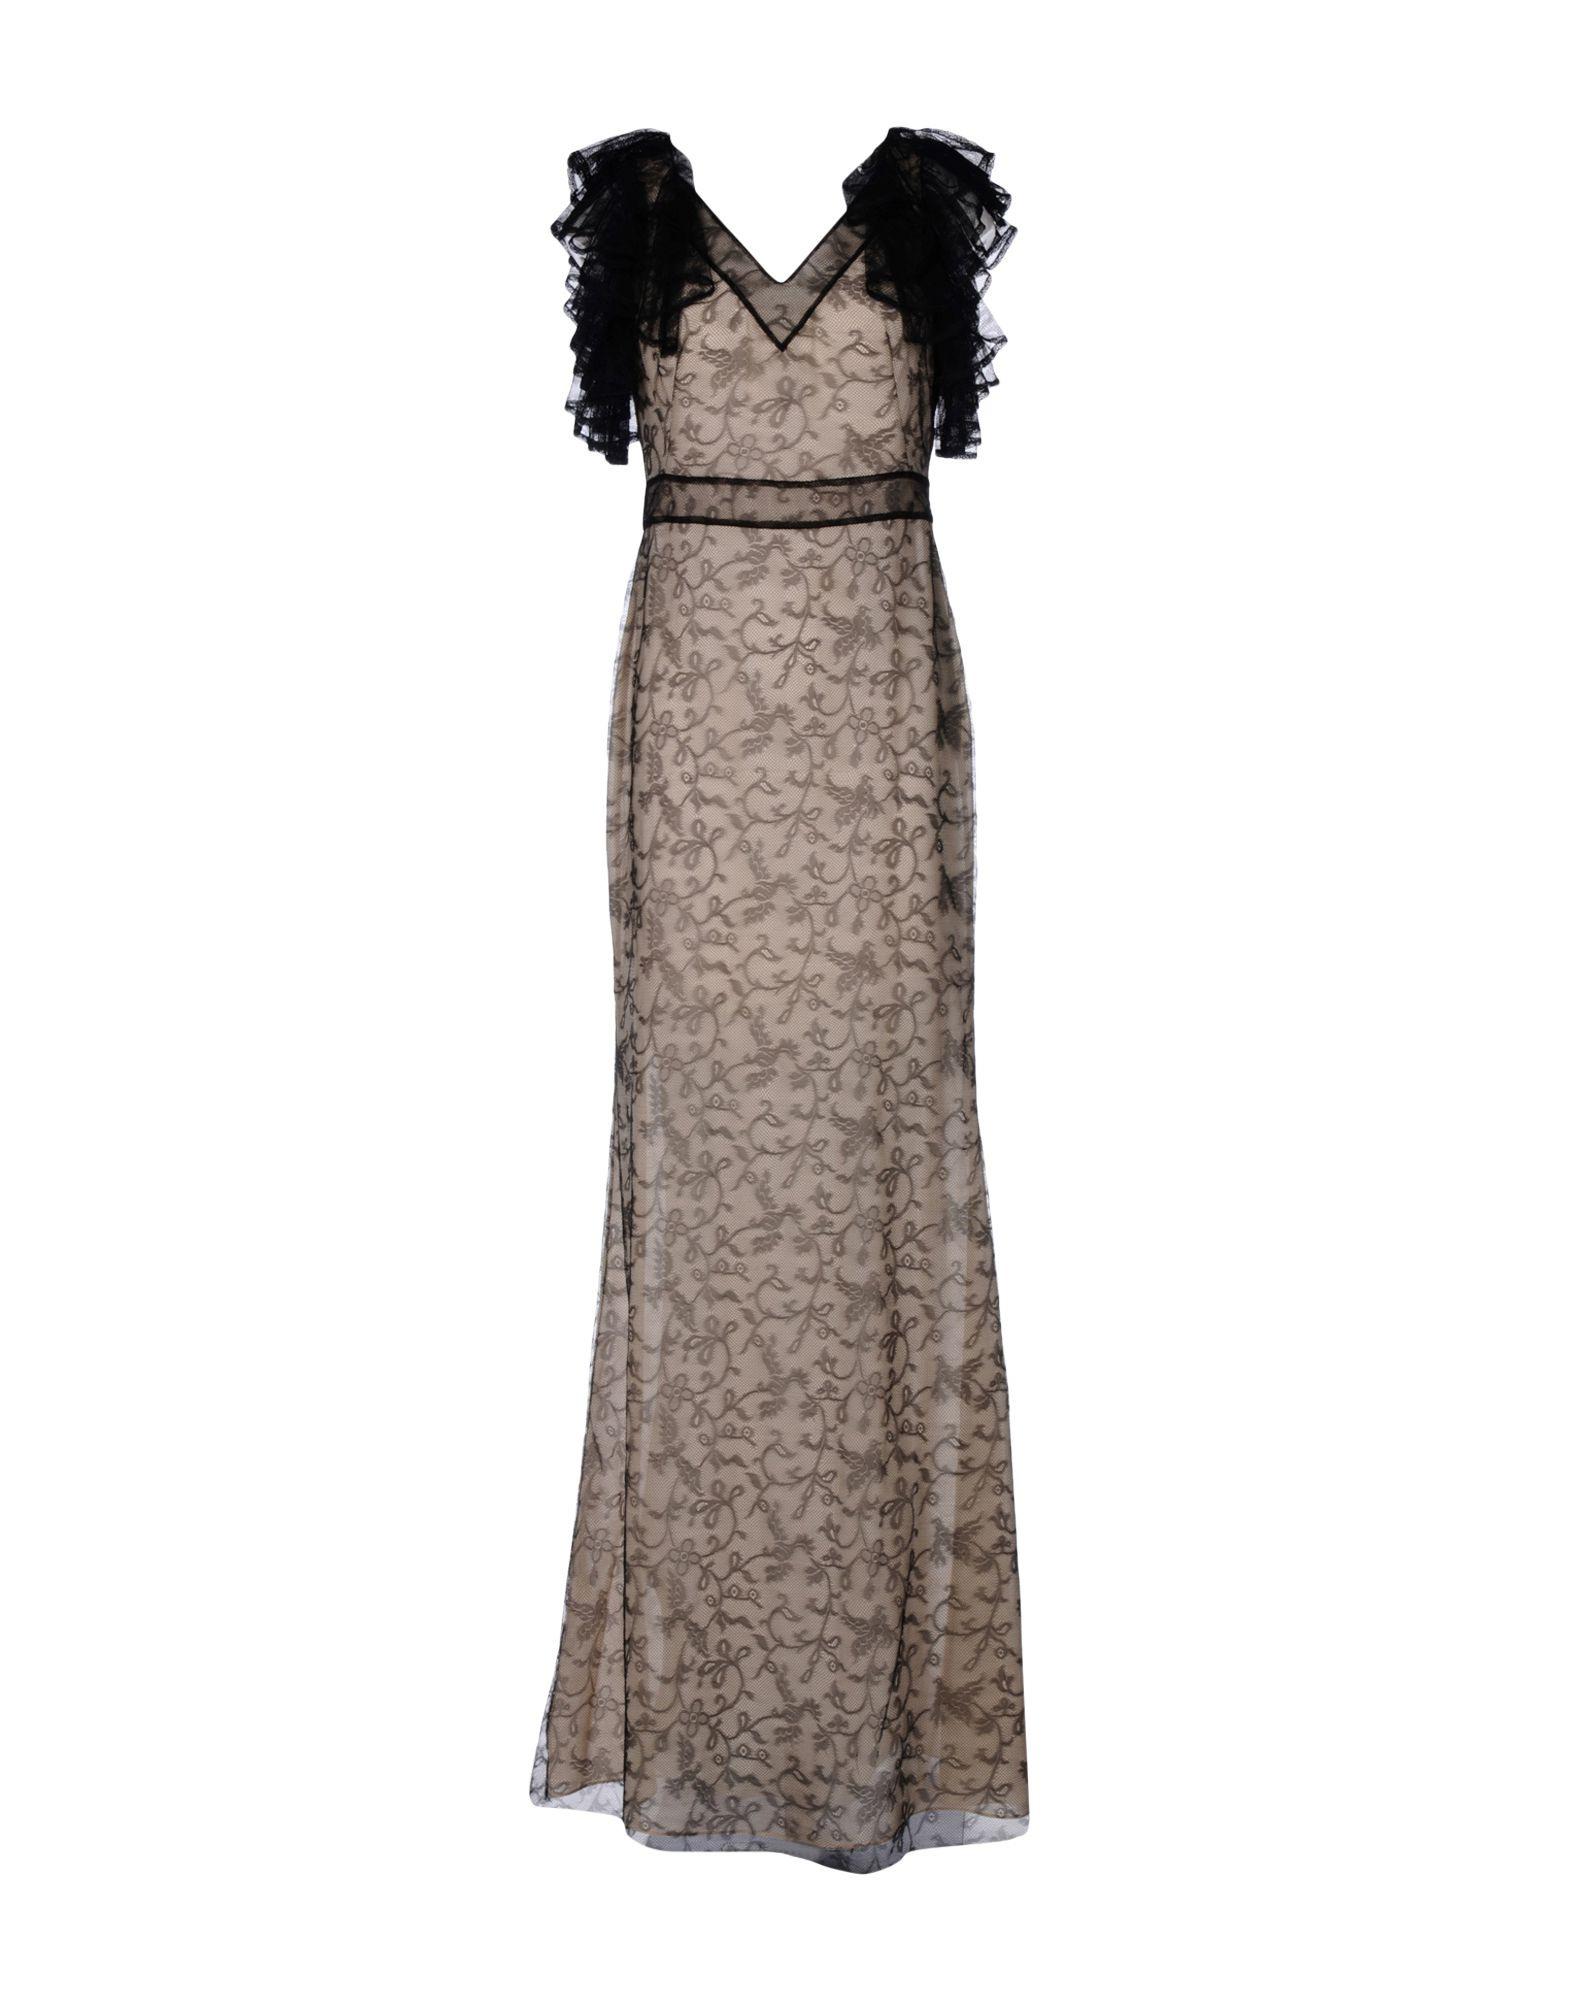 Elegant Yoox Abendkleid GalerieFormal Spektakulär Yoox Abendkleid Vertrieb